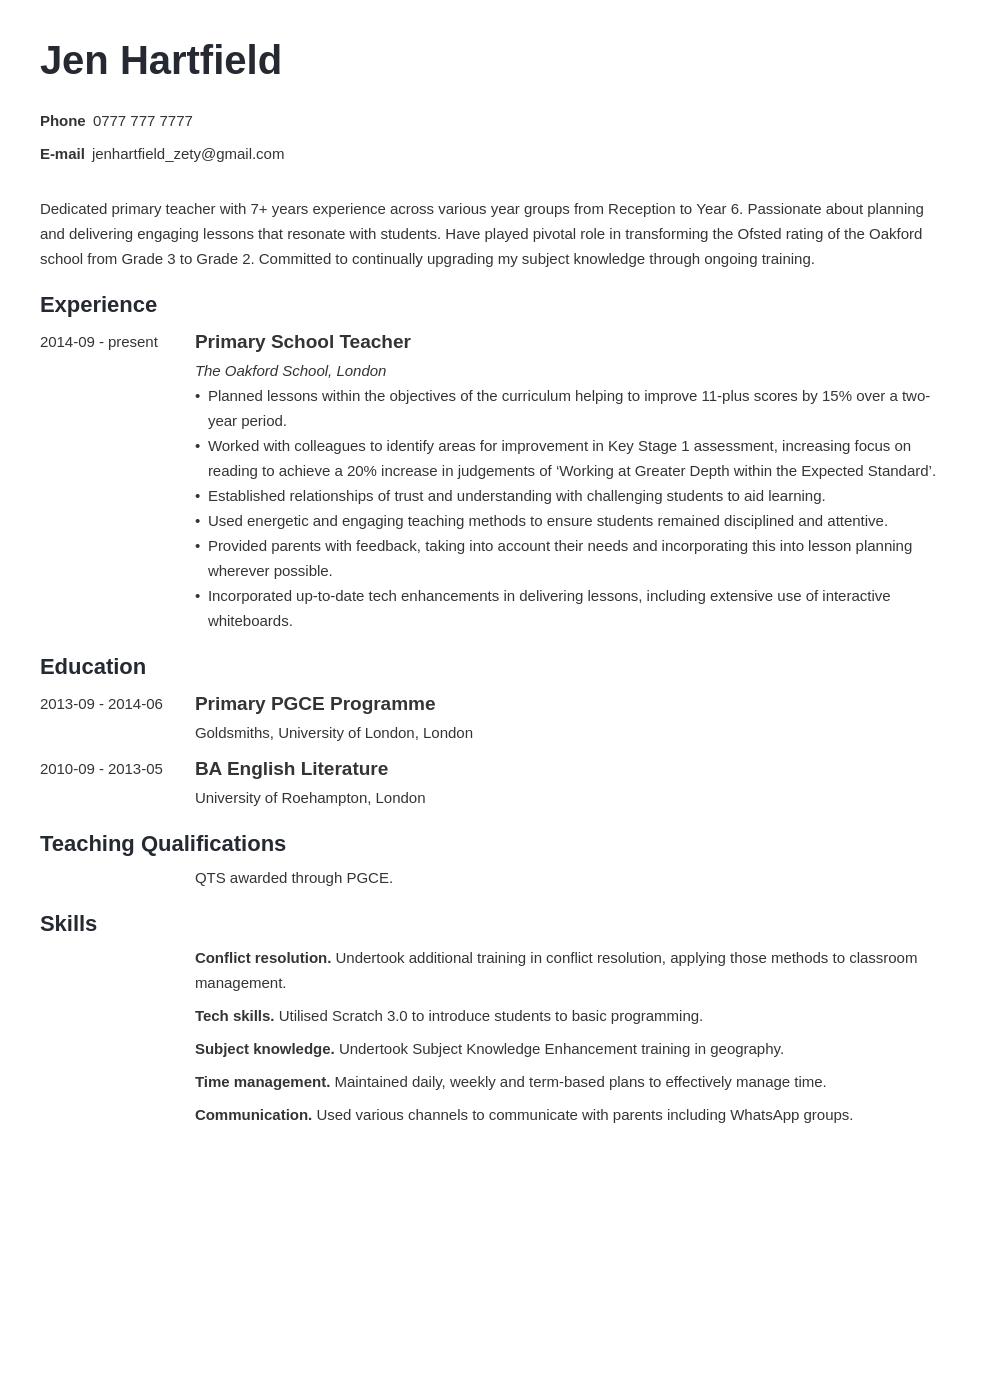 uk teacher cv example template minimo in 2020 Teaching